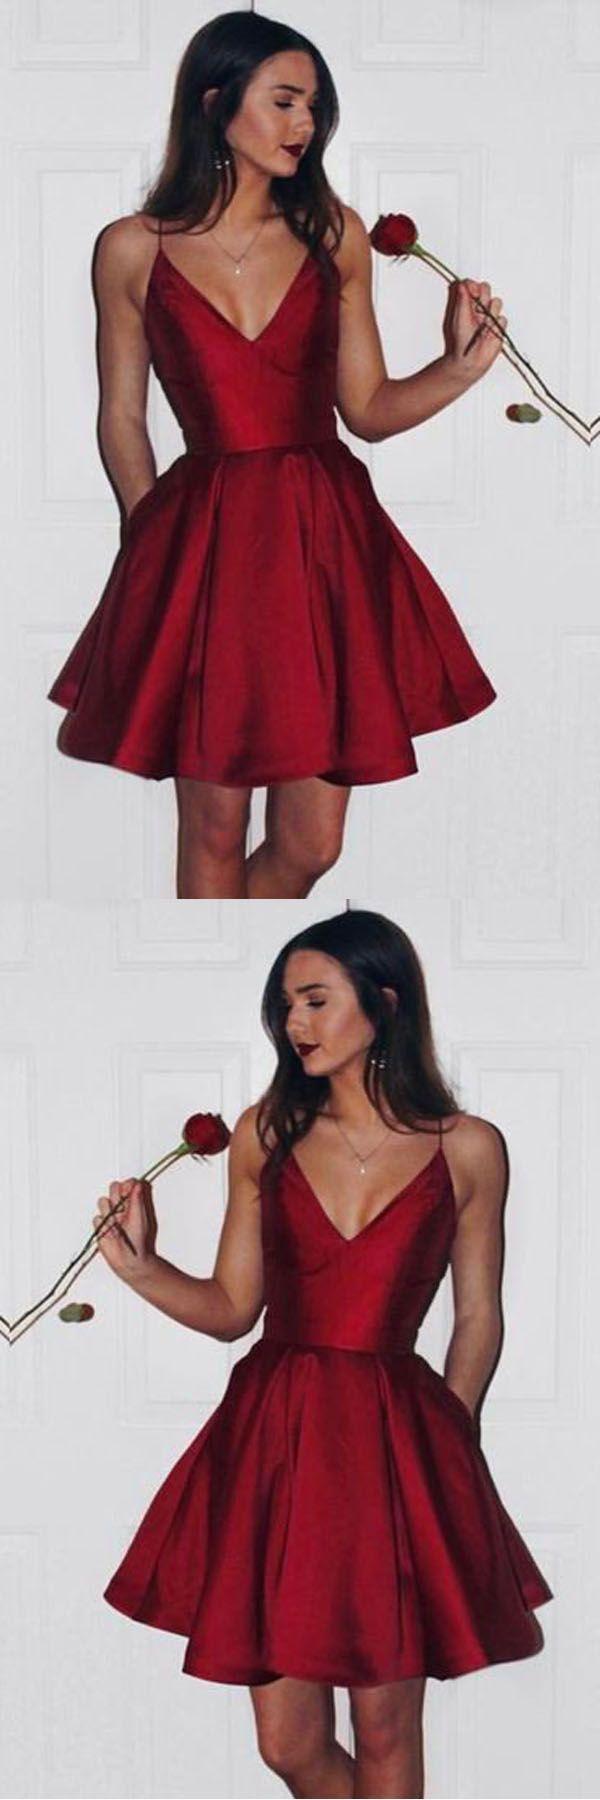 Burgundy Cute Simple Spaghetti Straps Homecoming Dress Party Dress PG125,Homecoming Dresses,Party Dresses,Prom Dresses,Evening Dresses,Short Prom Dresses